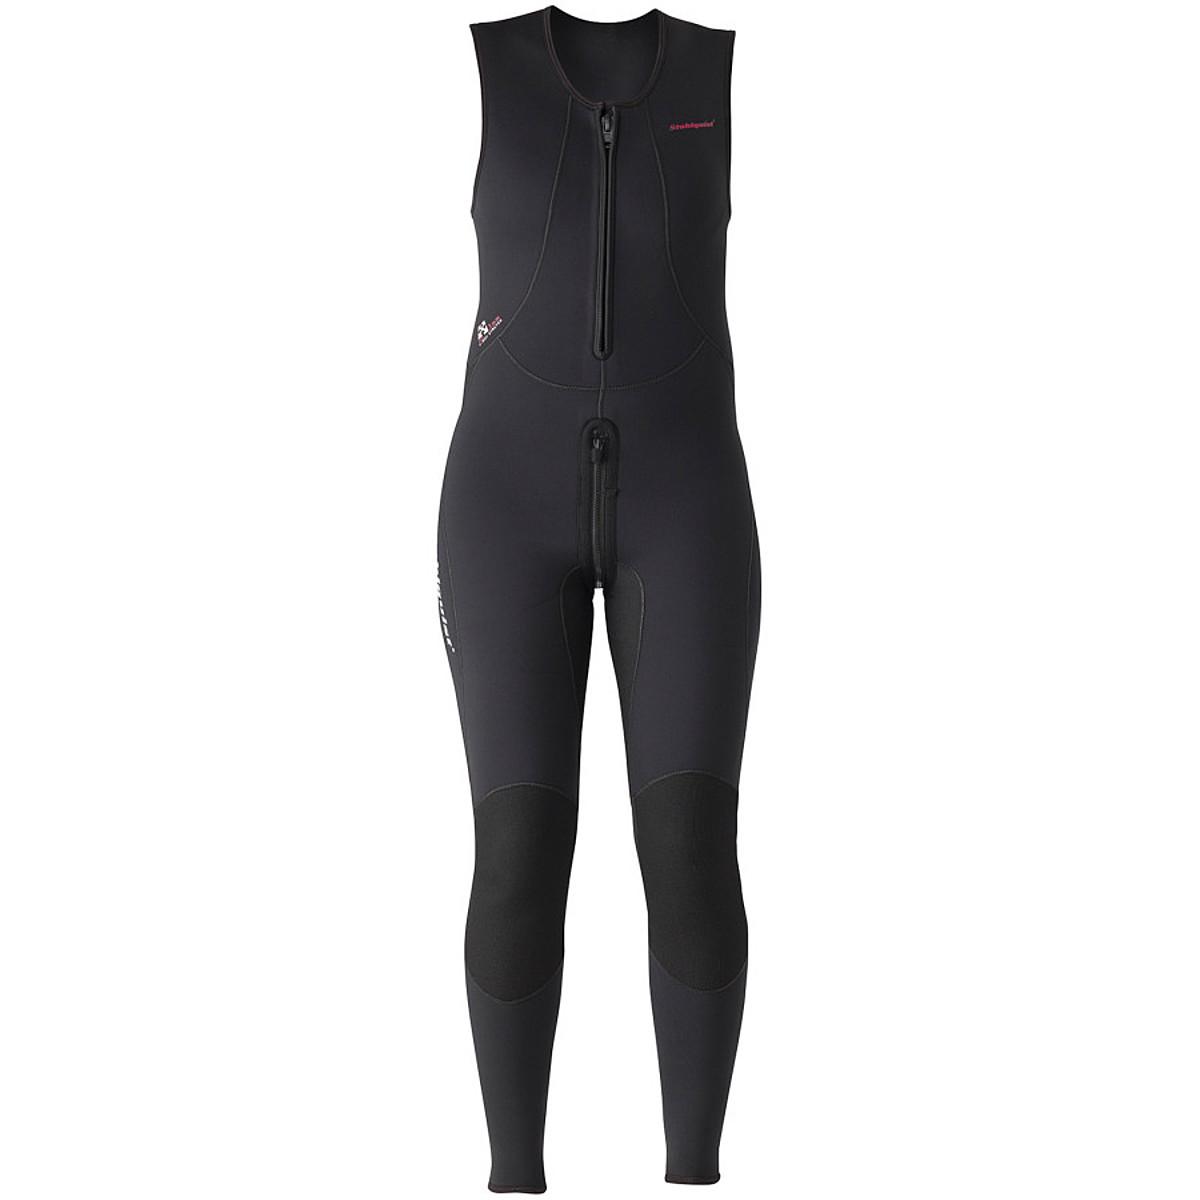 photo: Stohlquist Rapid Long Jane wet suit